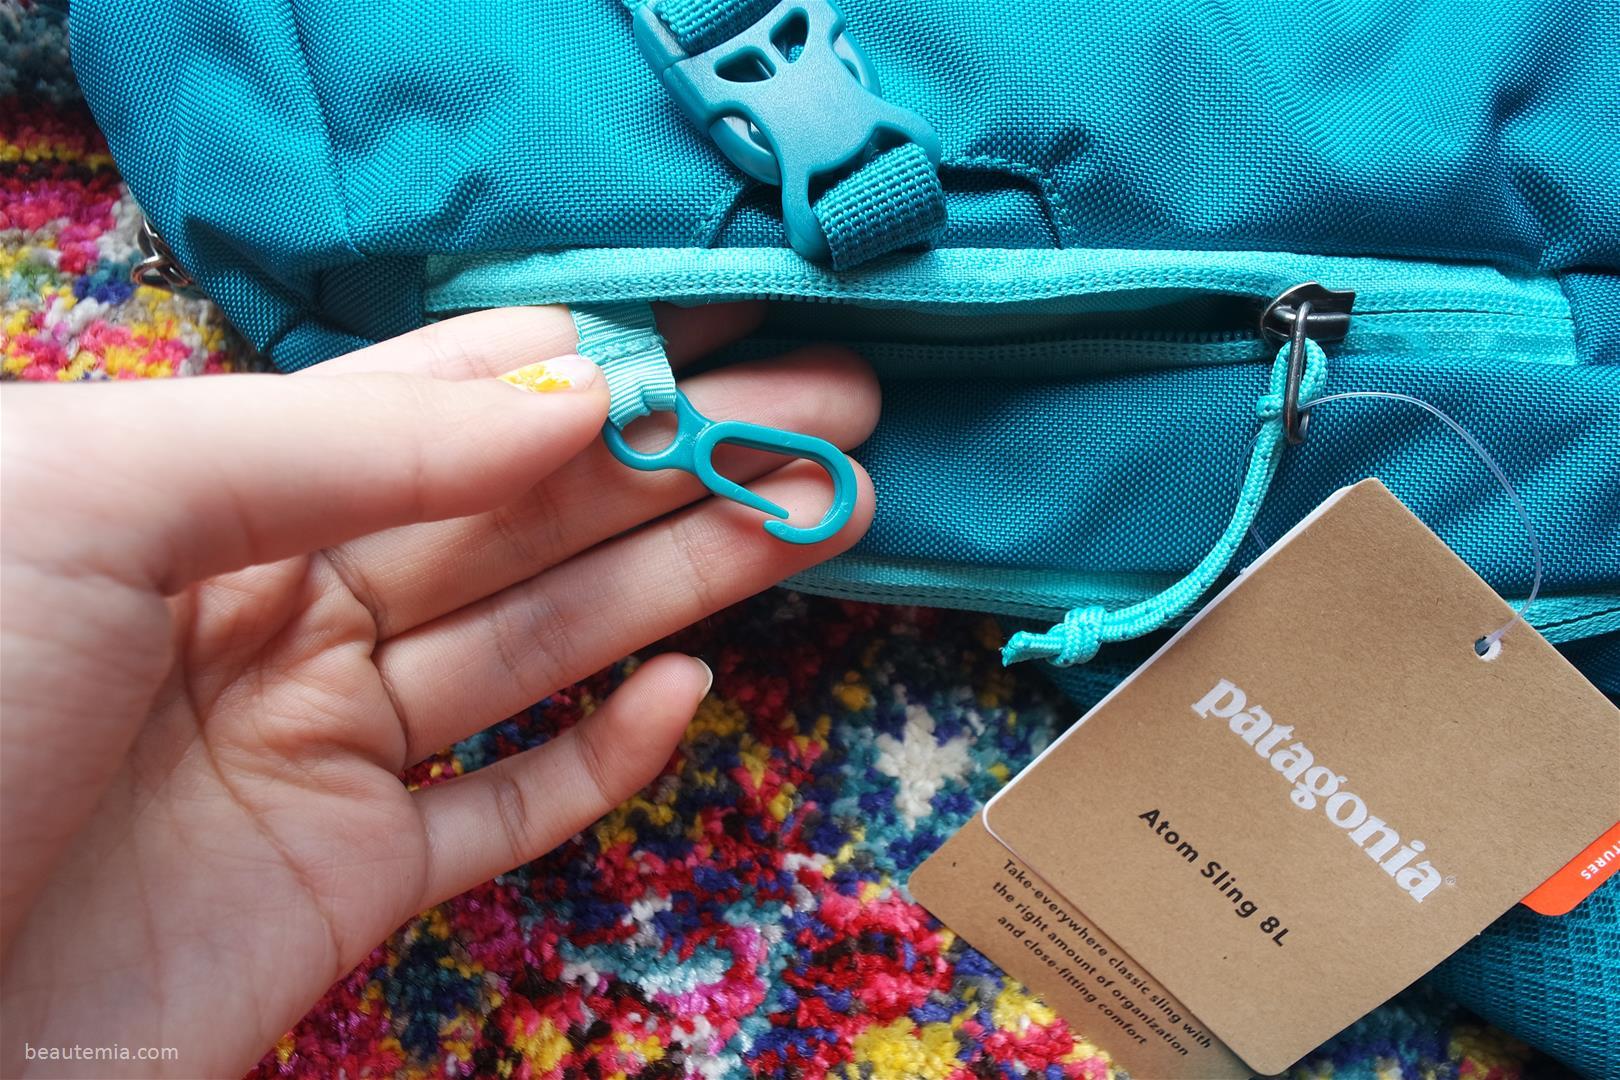 Patagonia, May Lindstrom, Kat Burki, Chantecaille, Tammy Fender, Patagonia backpack, Patagonia founder, Patagonia mission, Patagonia ski, Patagonia jacket, Patagonia coat & Patagonia review